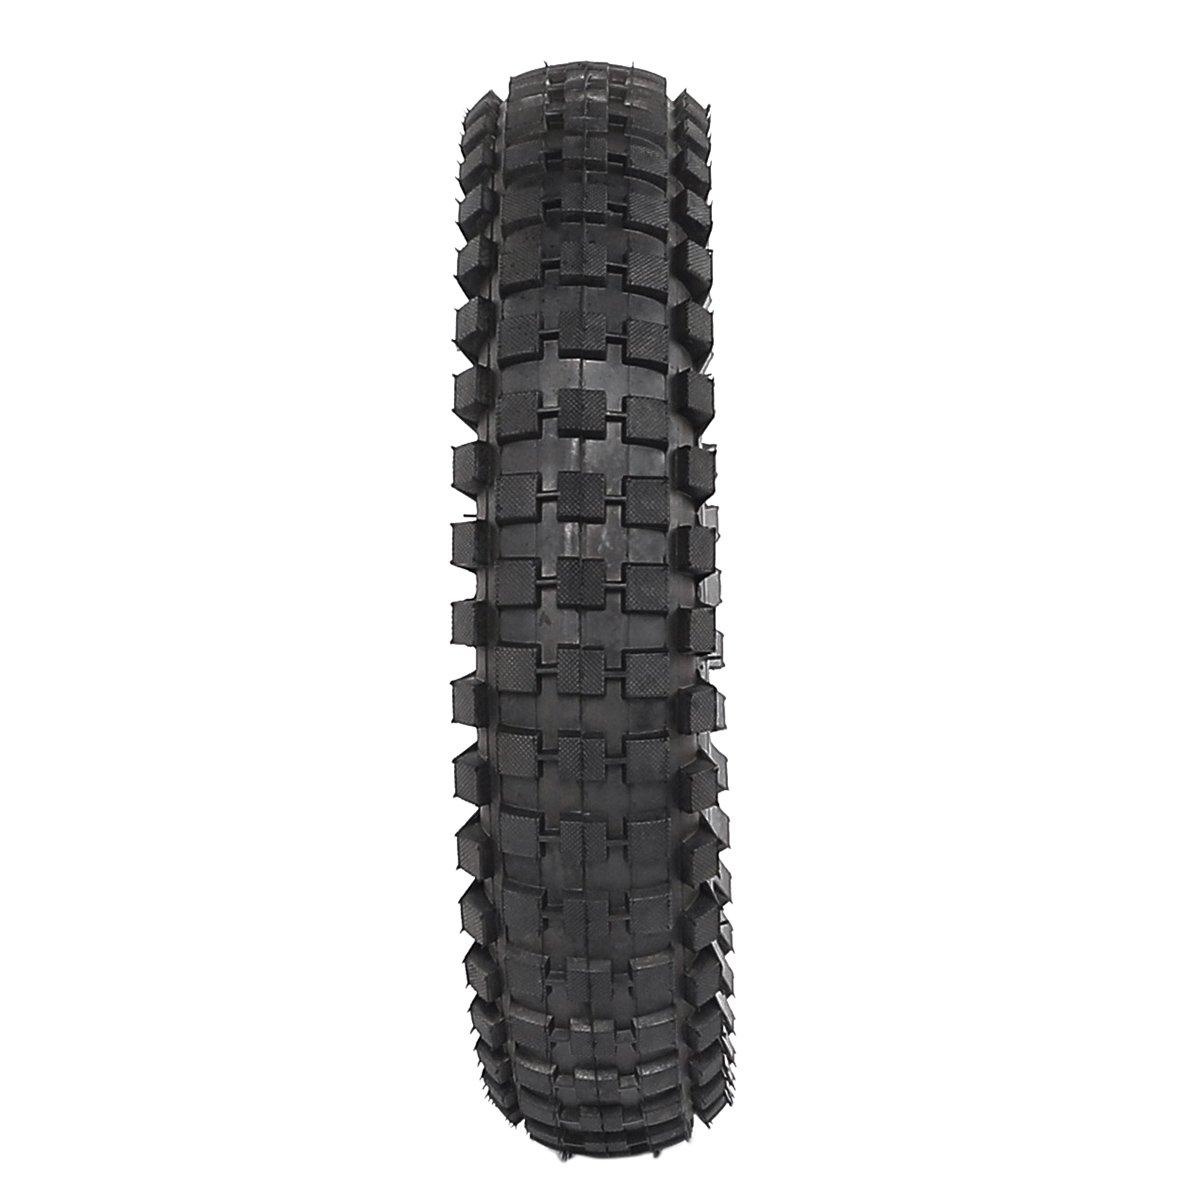 TDPRO 2 Sets 12 1//2 x 2.75 Tire and Inner Tube For Mini Pocket Bikes Razor Dirt Bike Rocket Dune Buggy 12.5 x 2.75